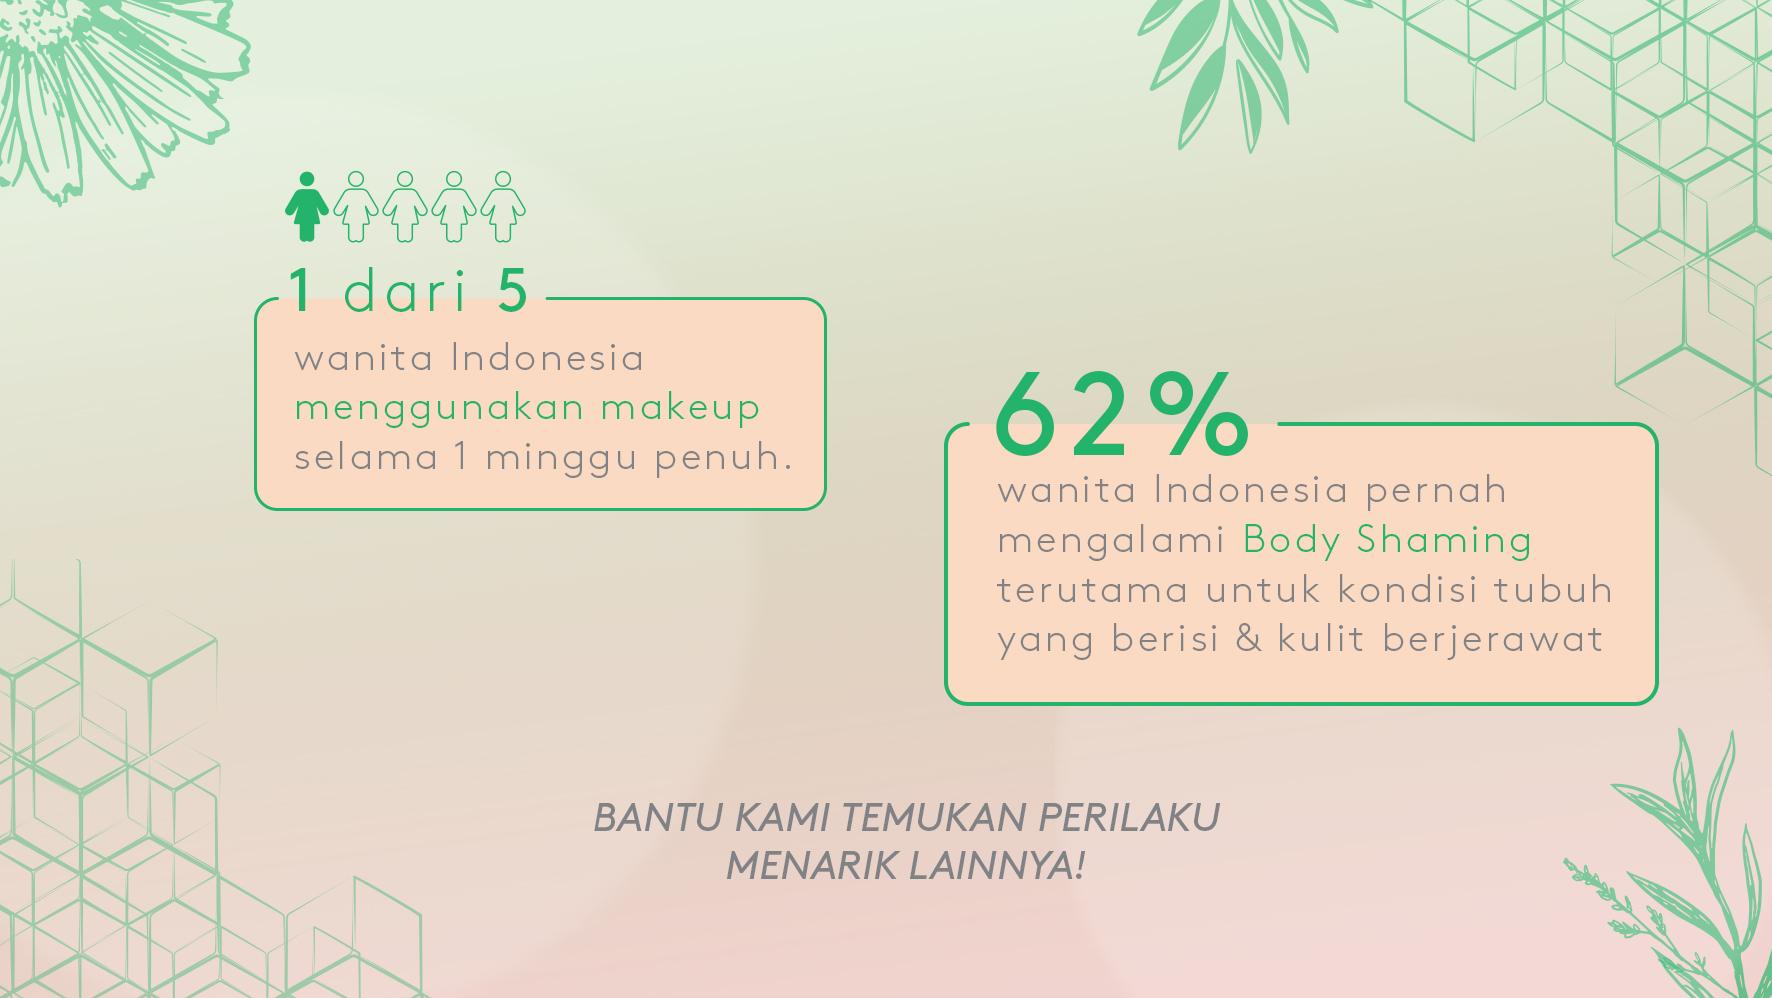 ZAP Baeuty Index 2021